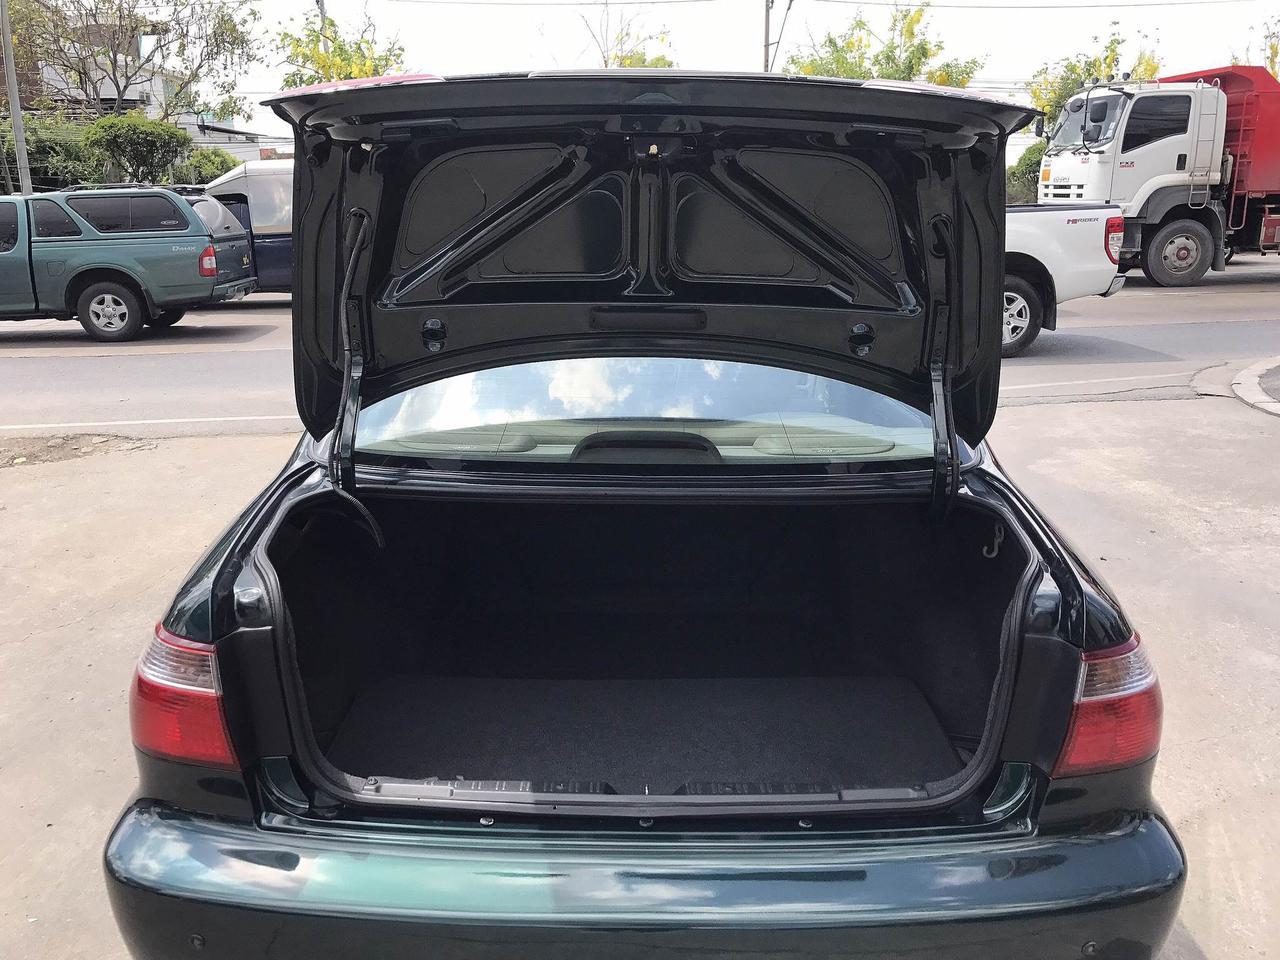 HONDA ACCORD 2.3 auto รุ่นงูเห่า ปี2001 รถบ้านสวยเดิมกริบสุด รูปที่ 5